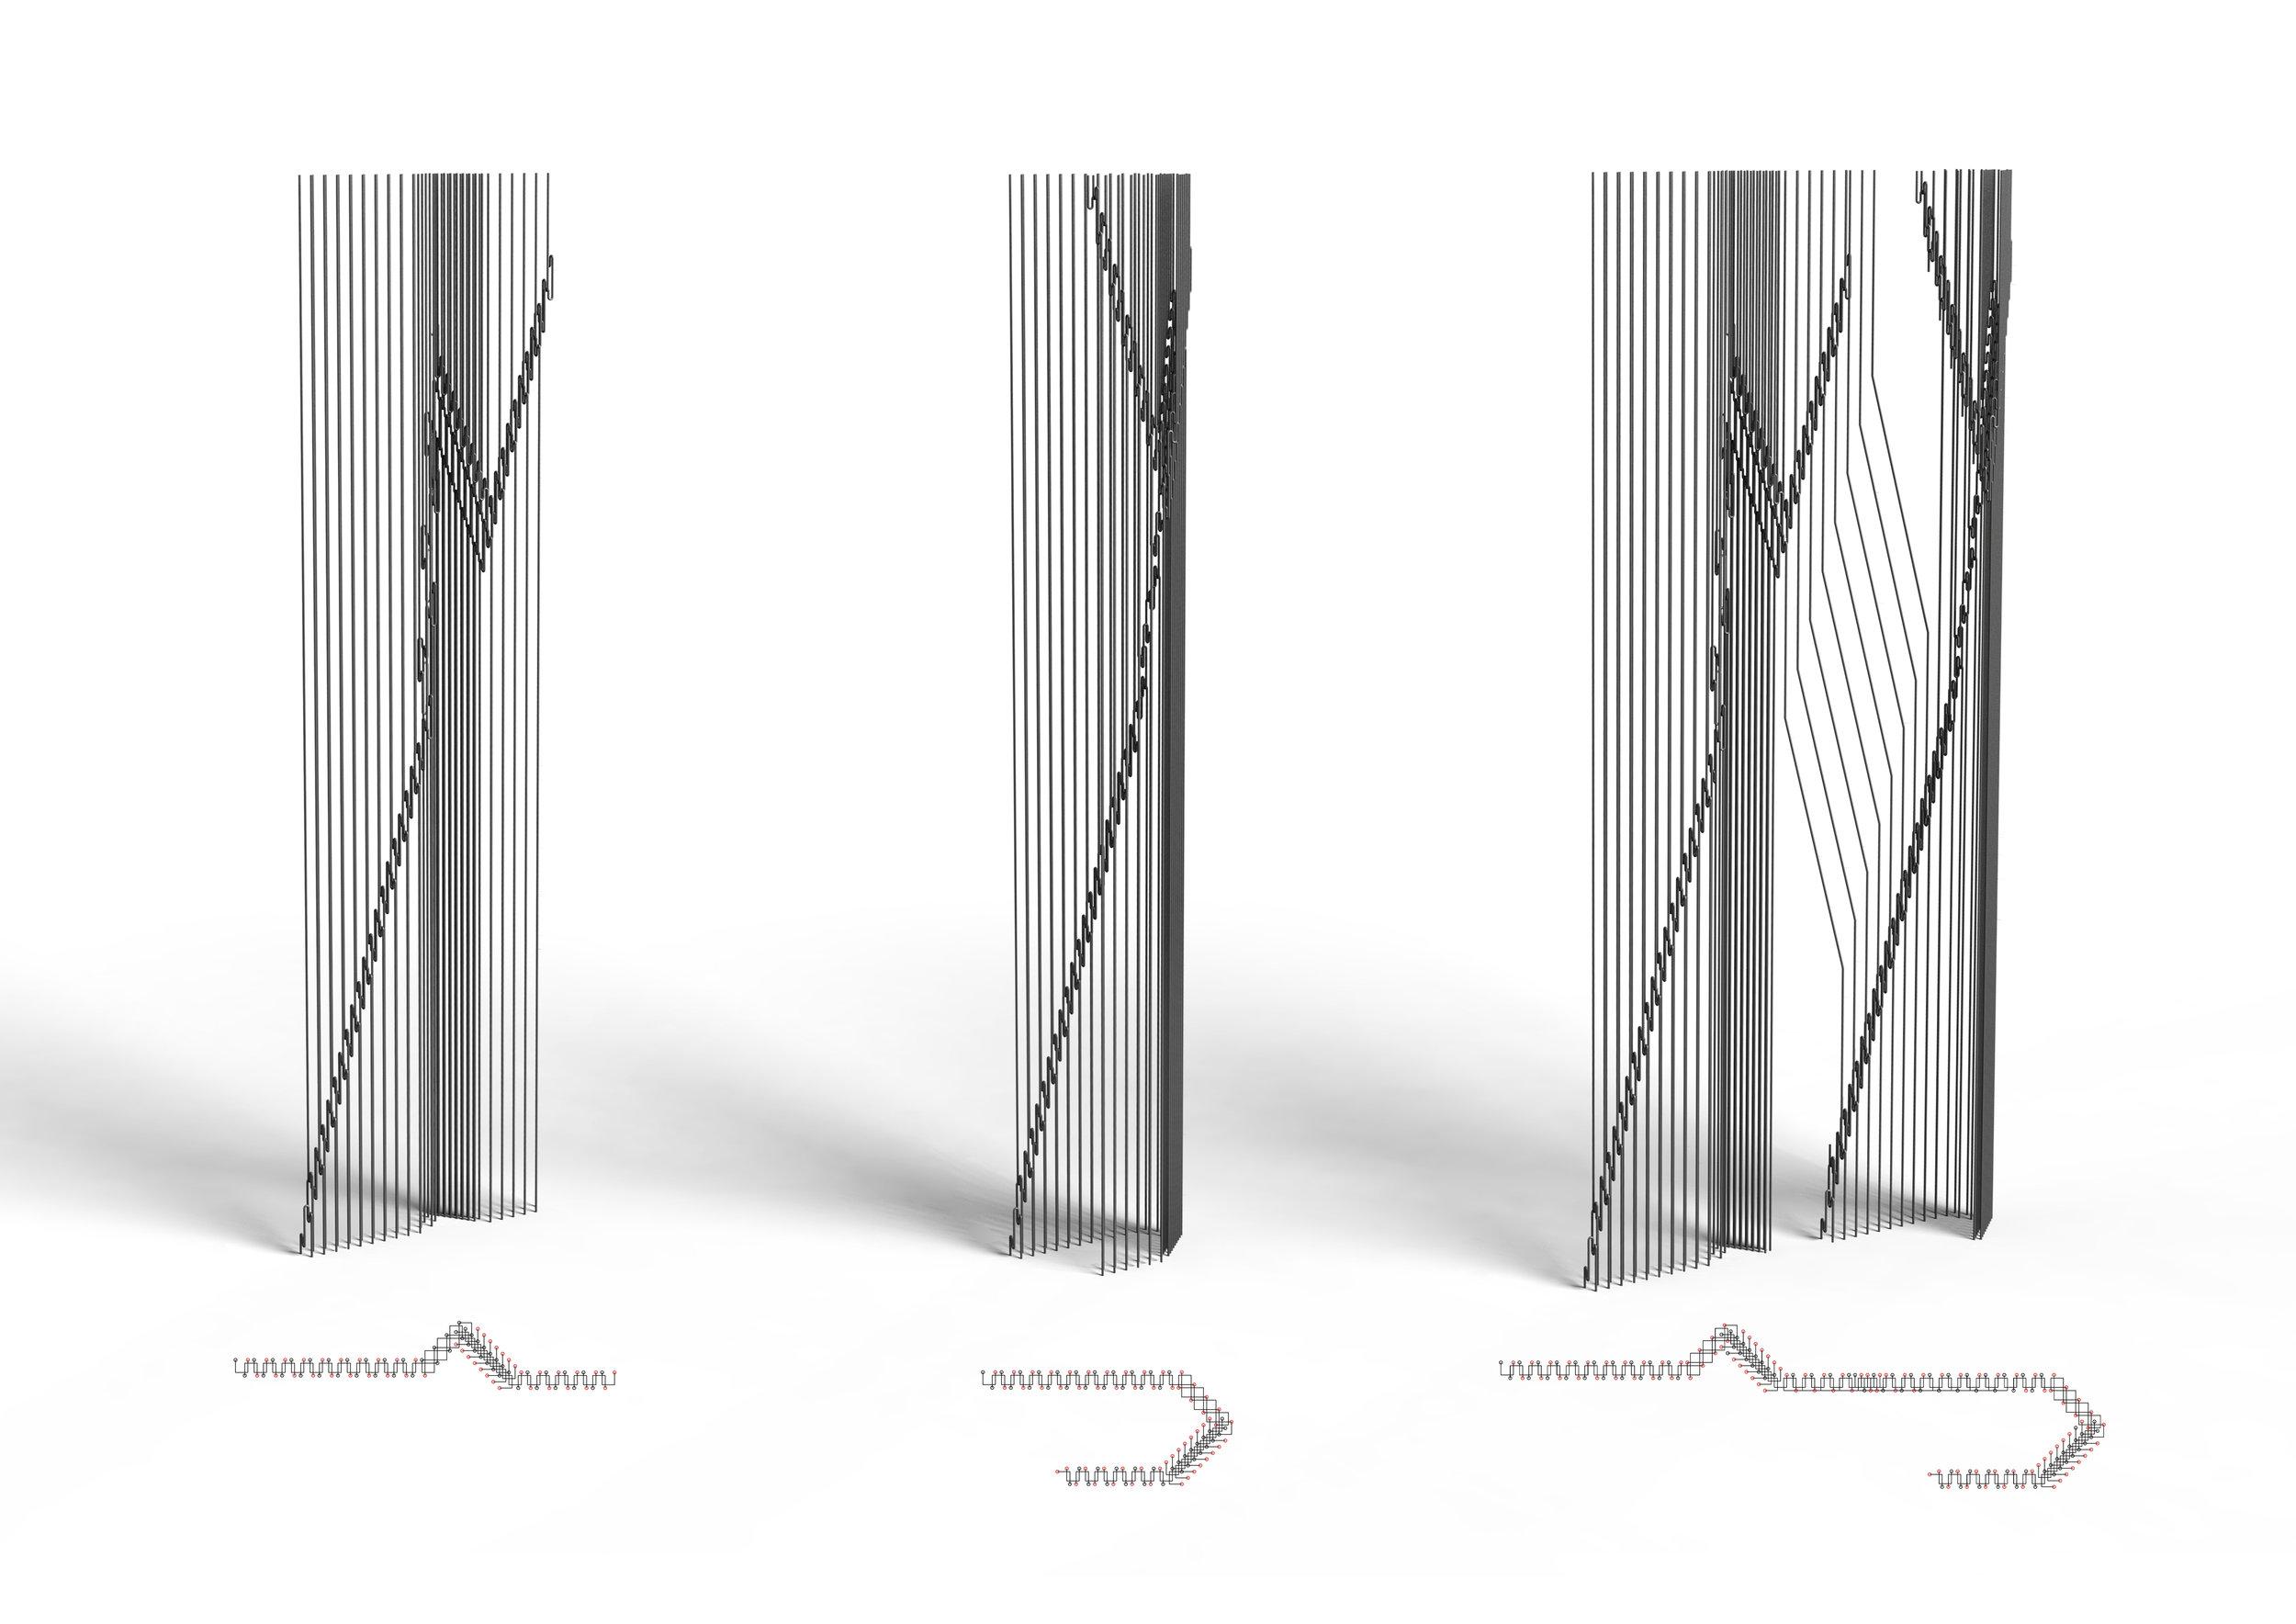 Unit 19_Mayer_Elliot_generative discrete assemblies.jpg